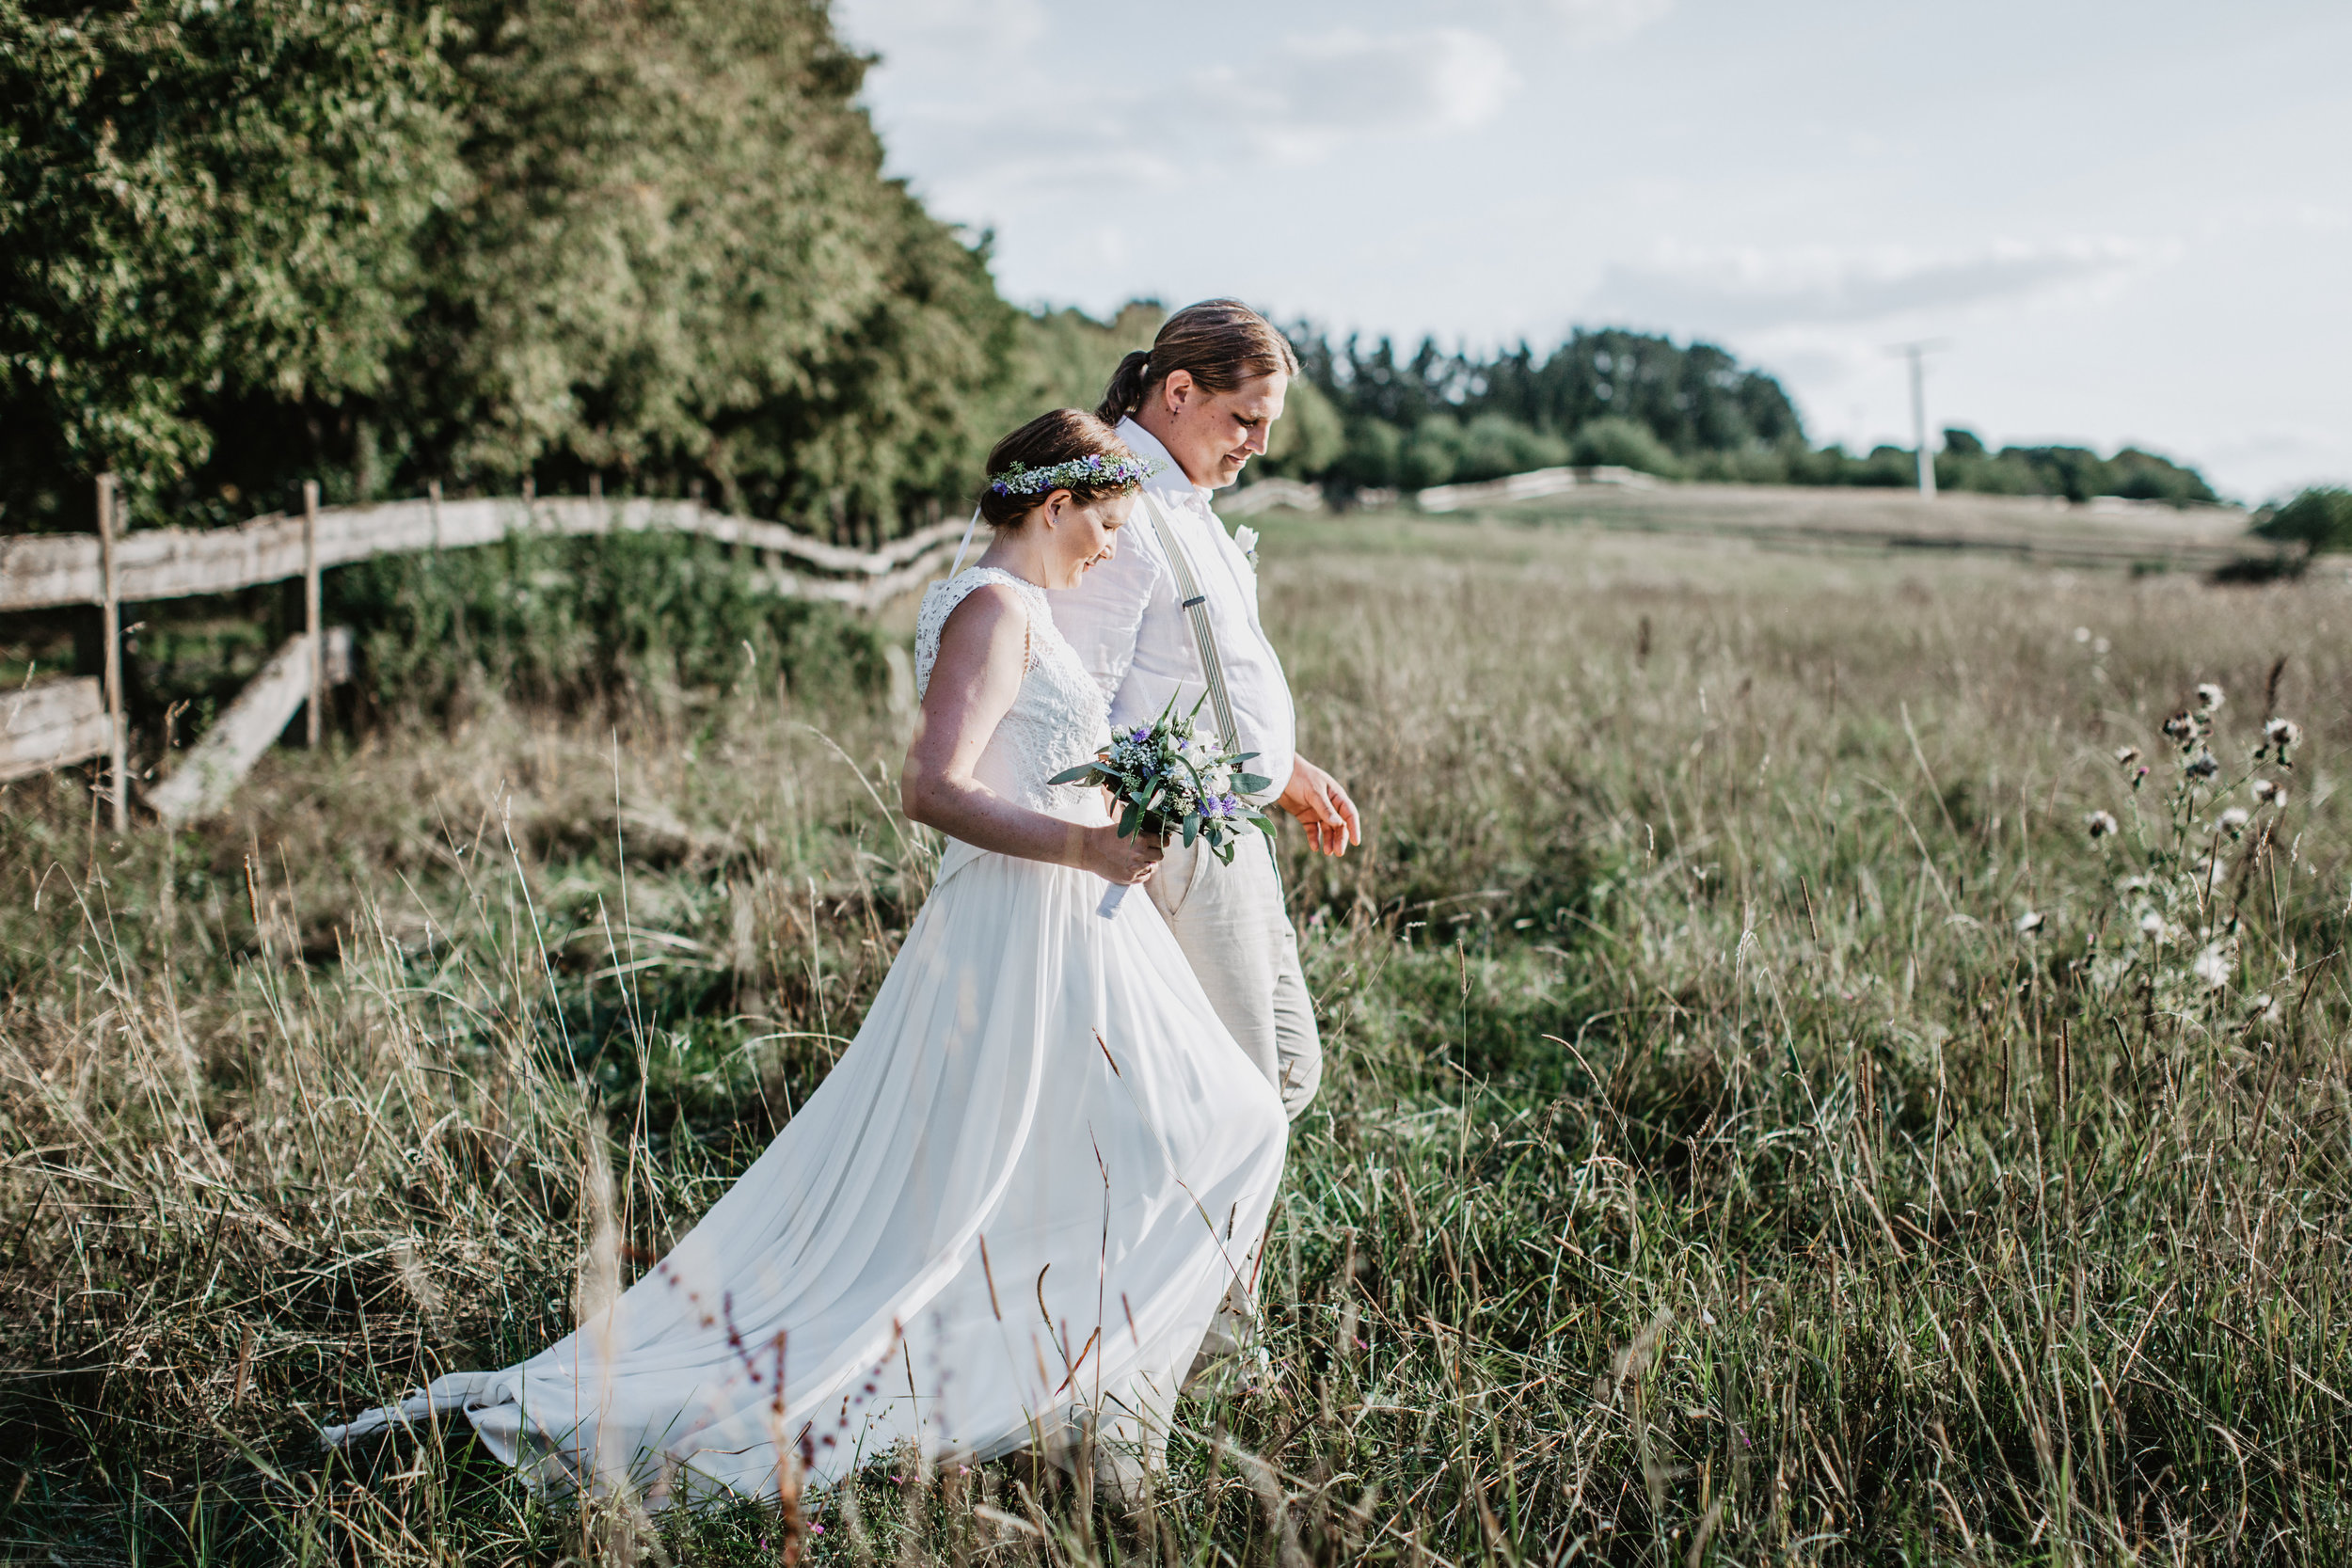 yessica-baur-fotografie-after-wedding-tübingen-041-9171.JPG